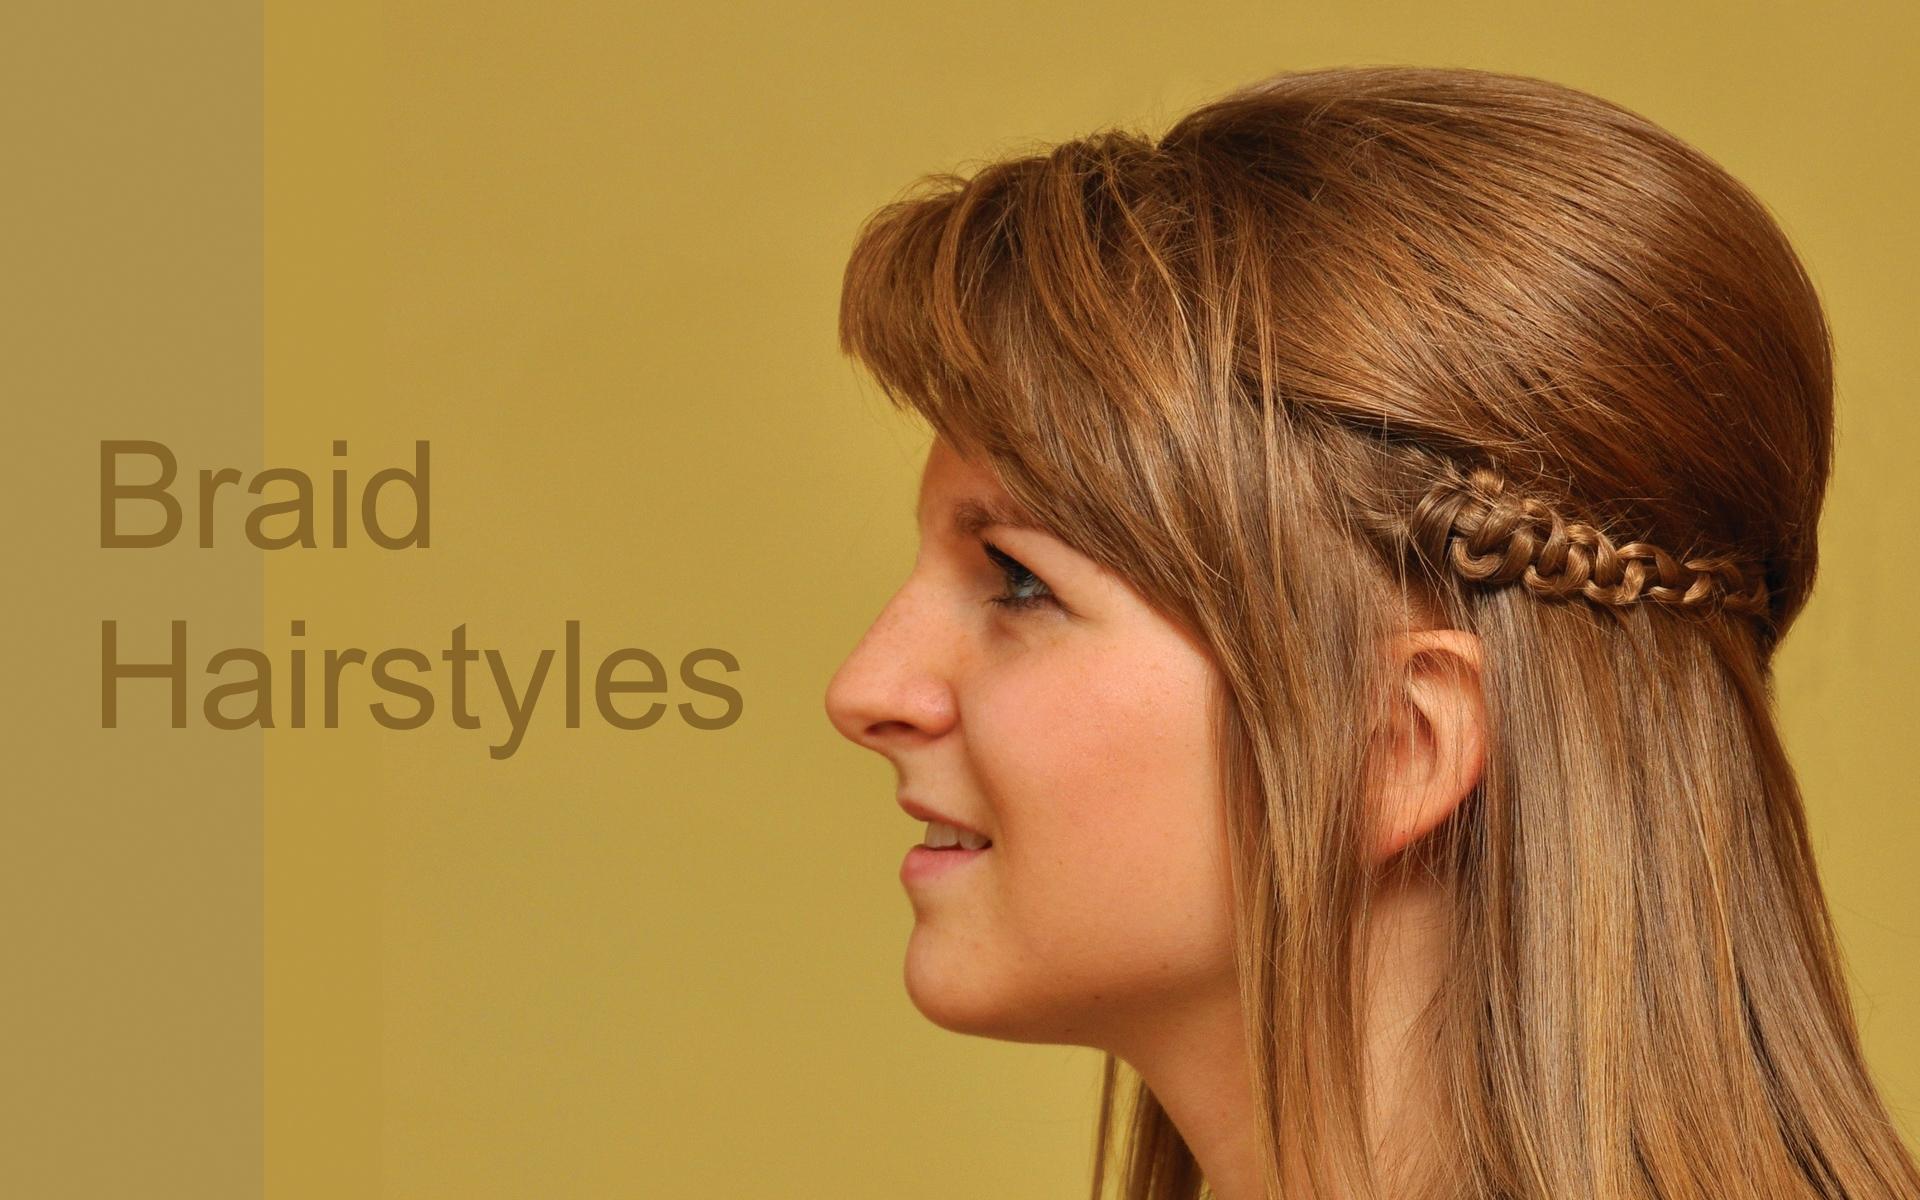 Hairstyles Braids Download: Braid Hairstyles HD Wallpaper